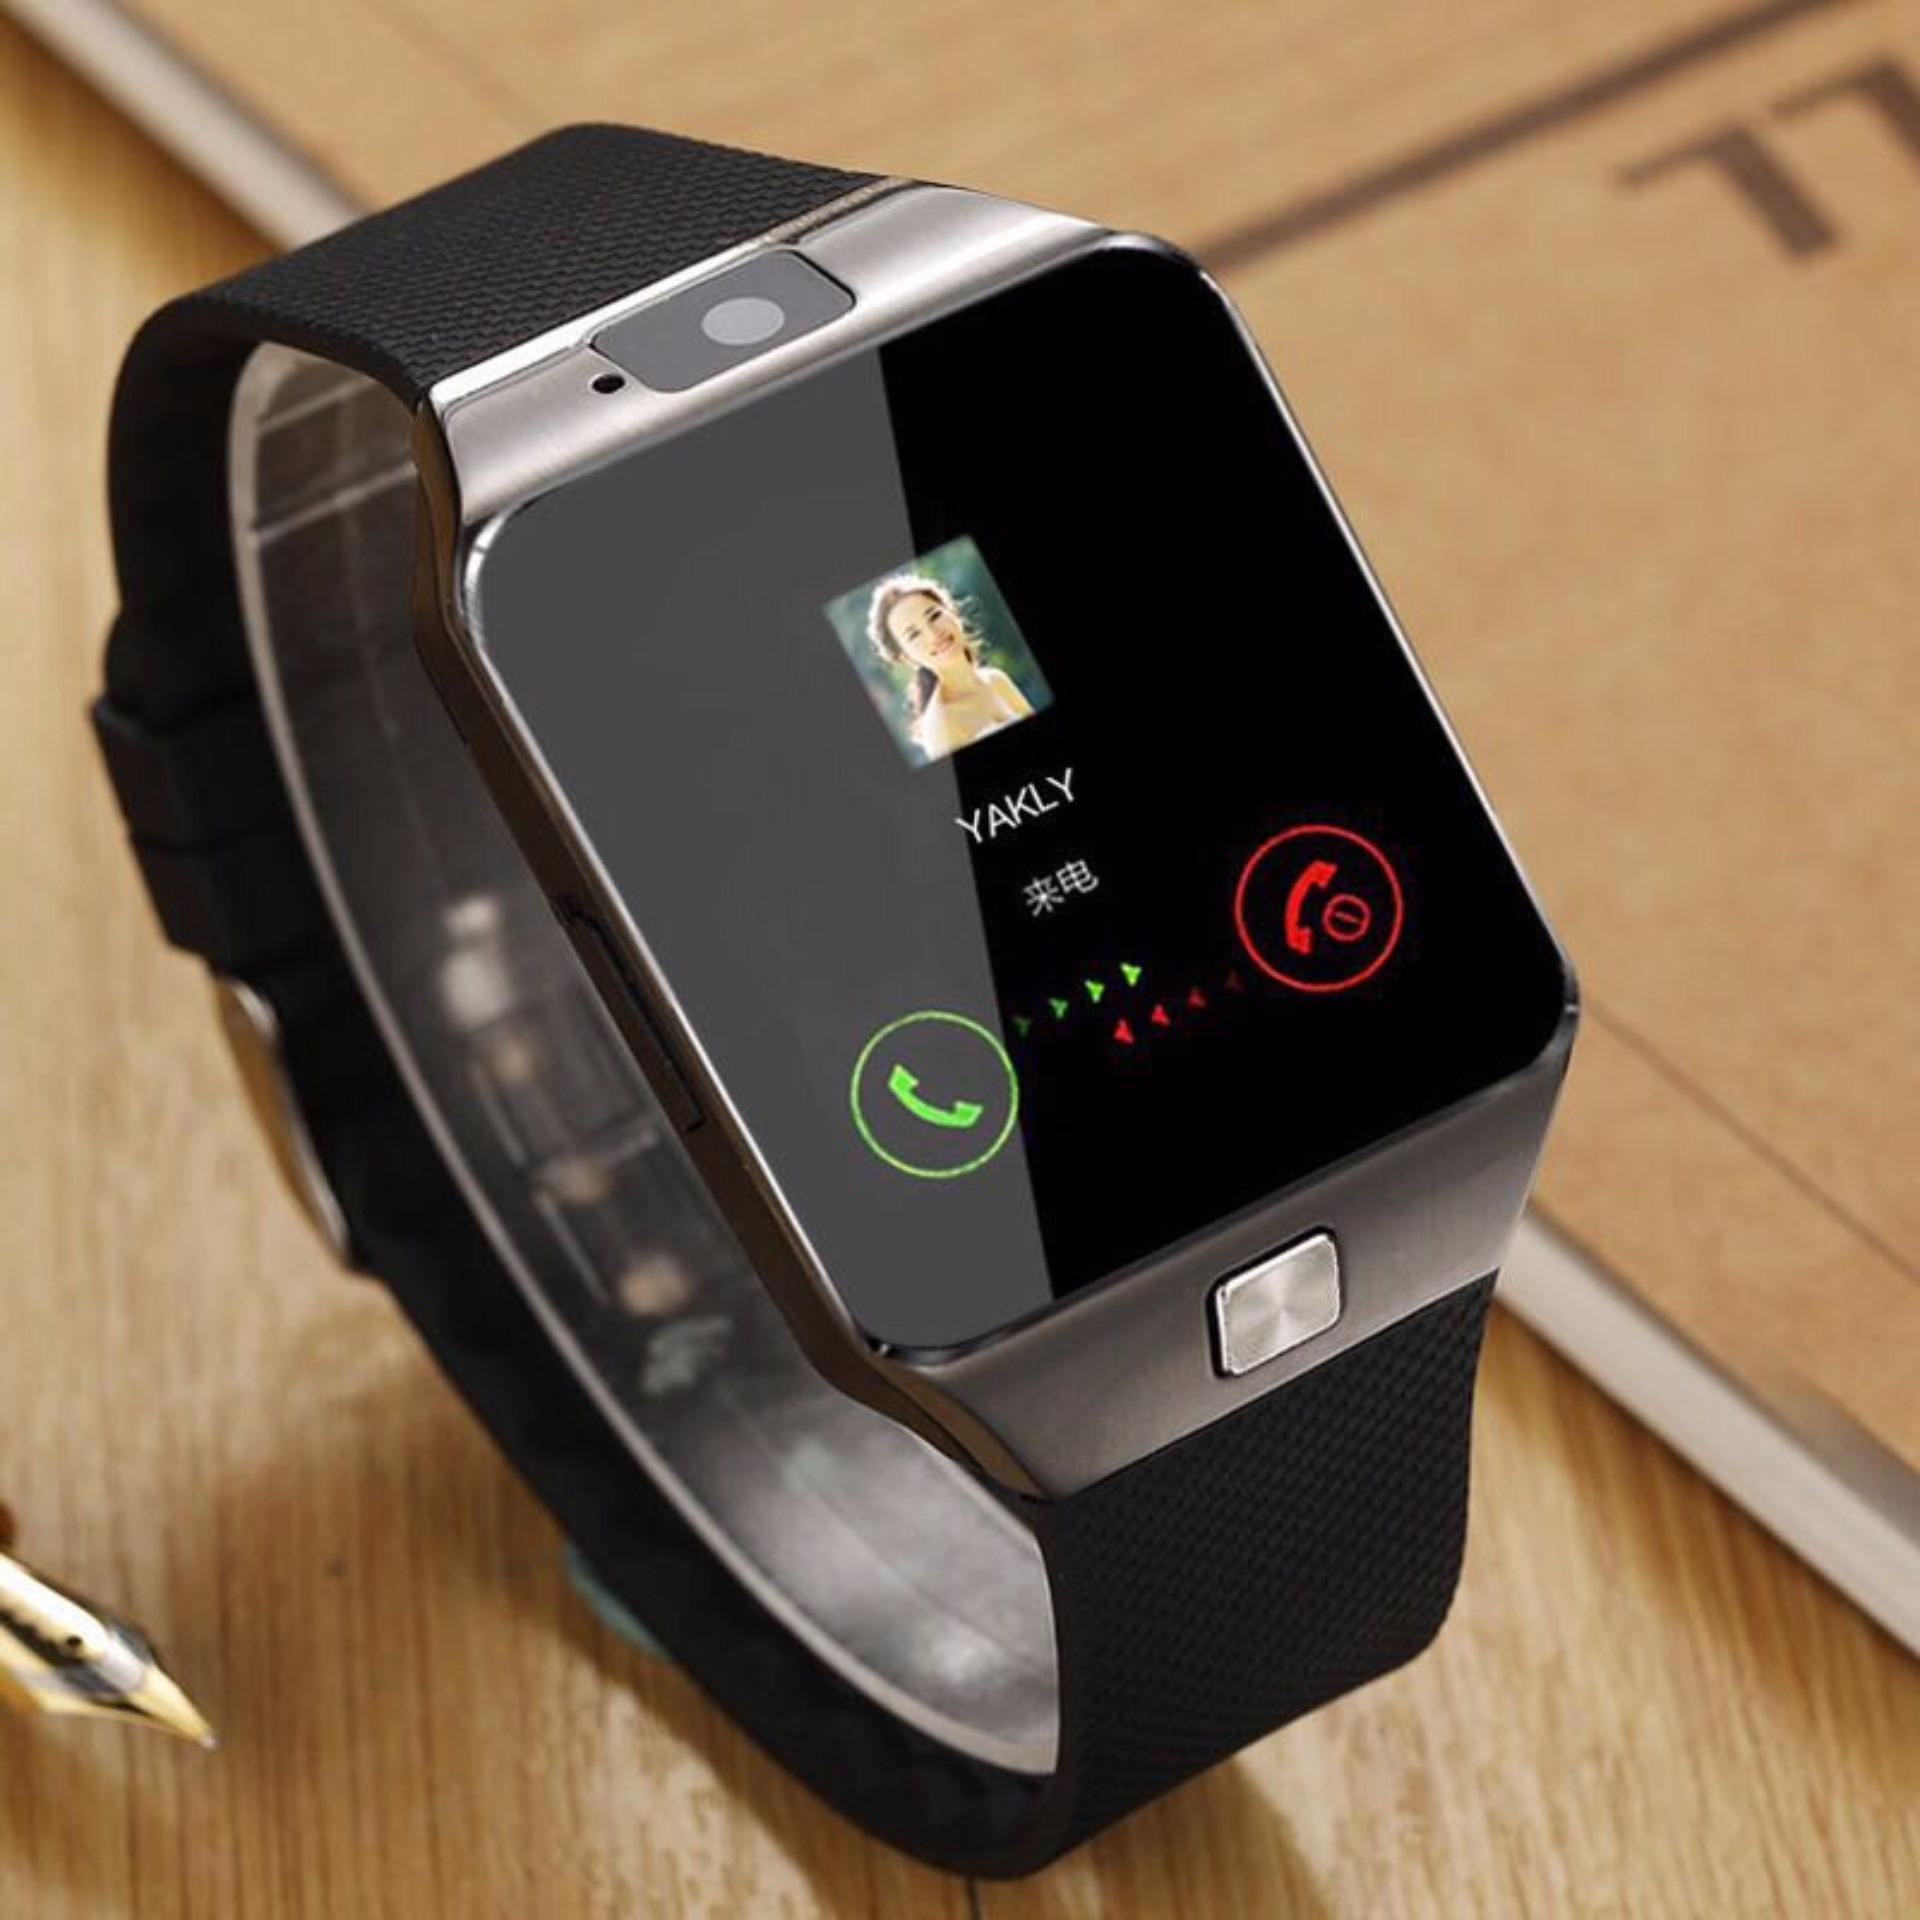 M99 quad phone bluetooth touch screen smart watch black silver lazada ph